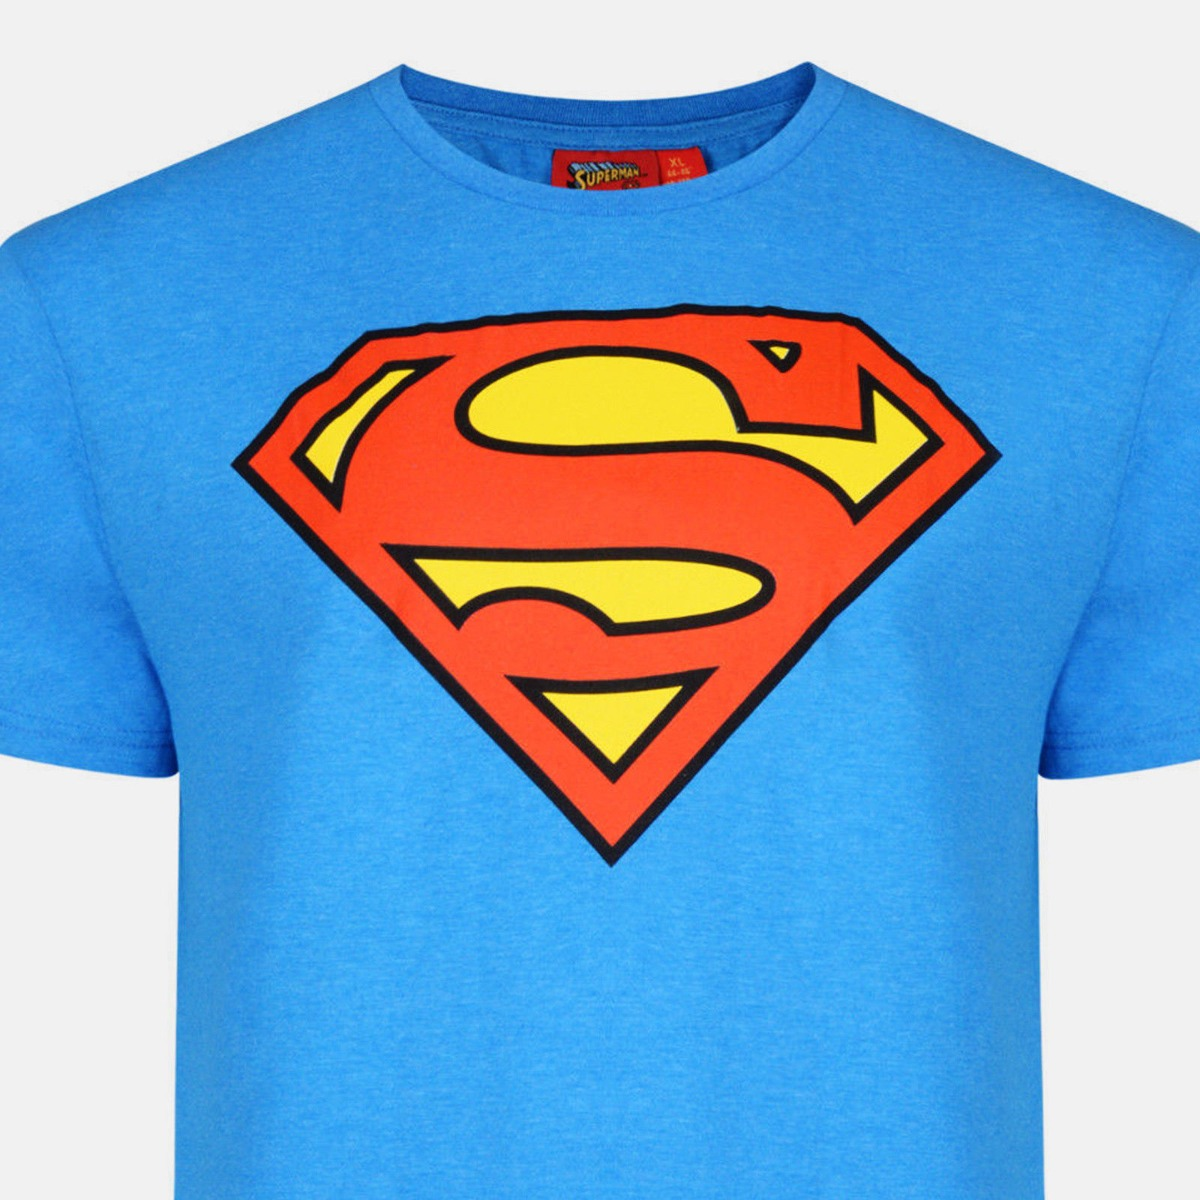 Official-Mens-Superman-T-Shirt-DC-Comic-Tee-Top-Superhero-Logo-Slim-Fit-XS-2XL 縮圖 4